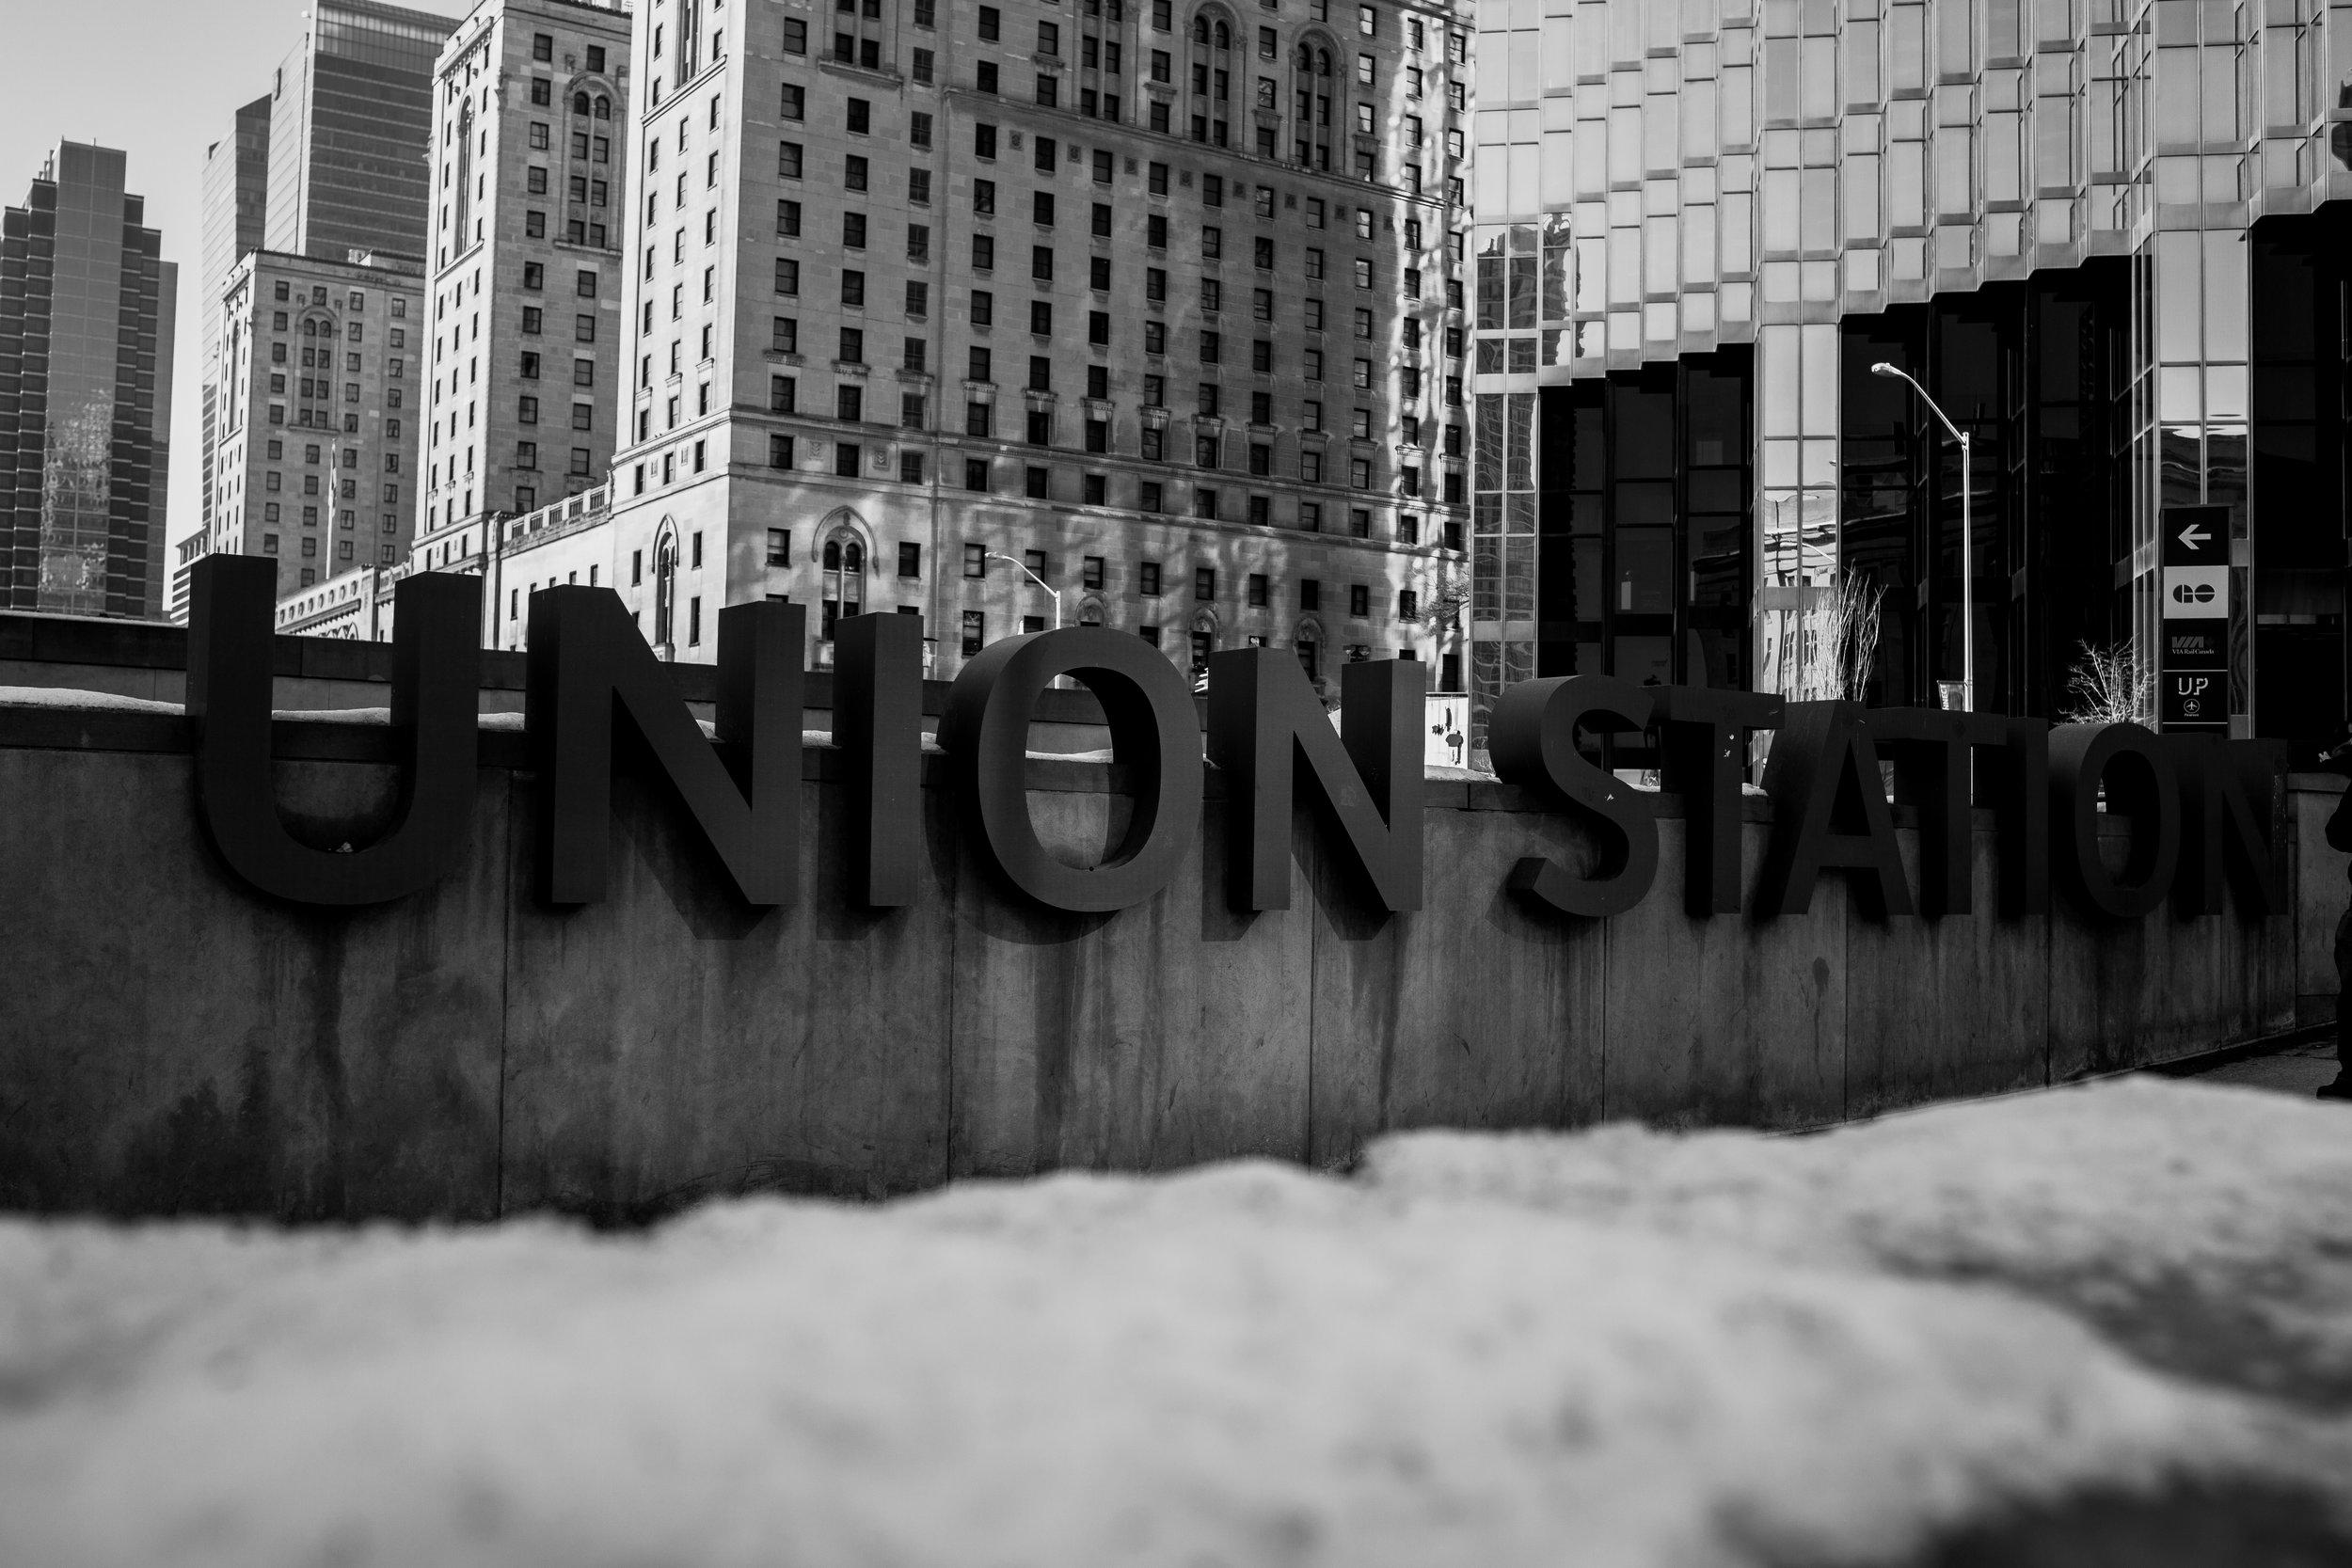 union sign.jpg